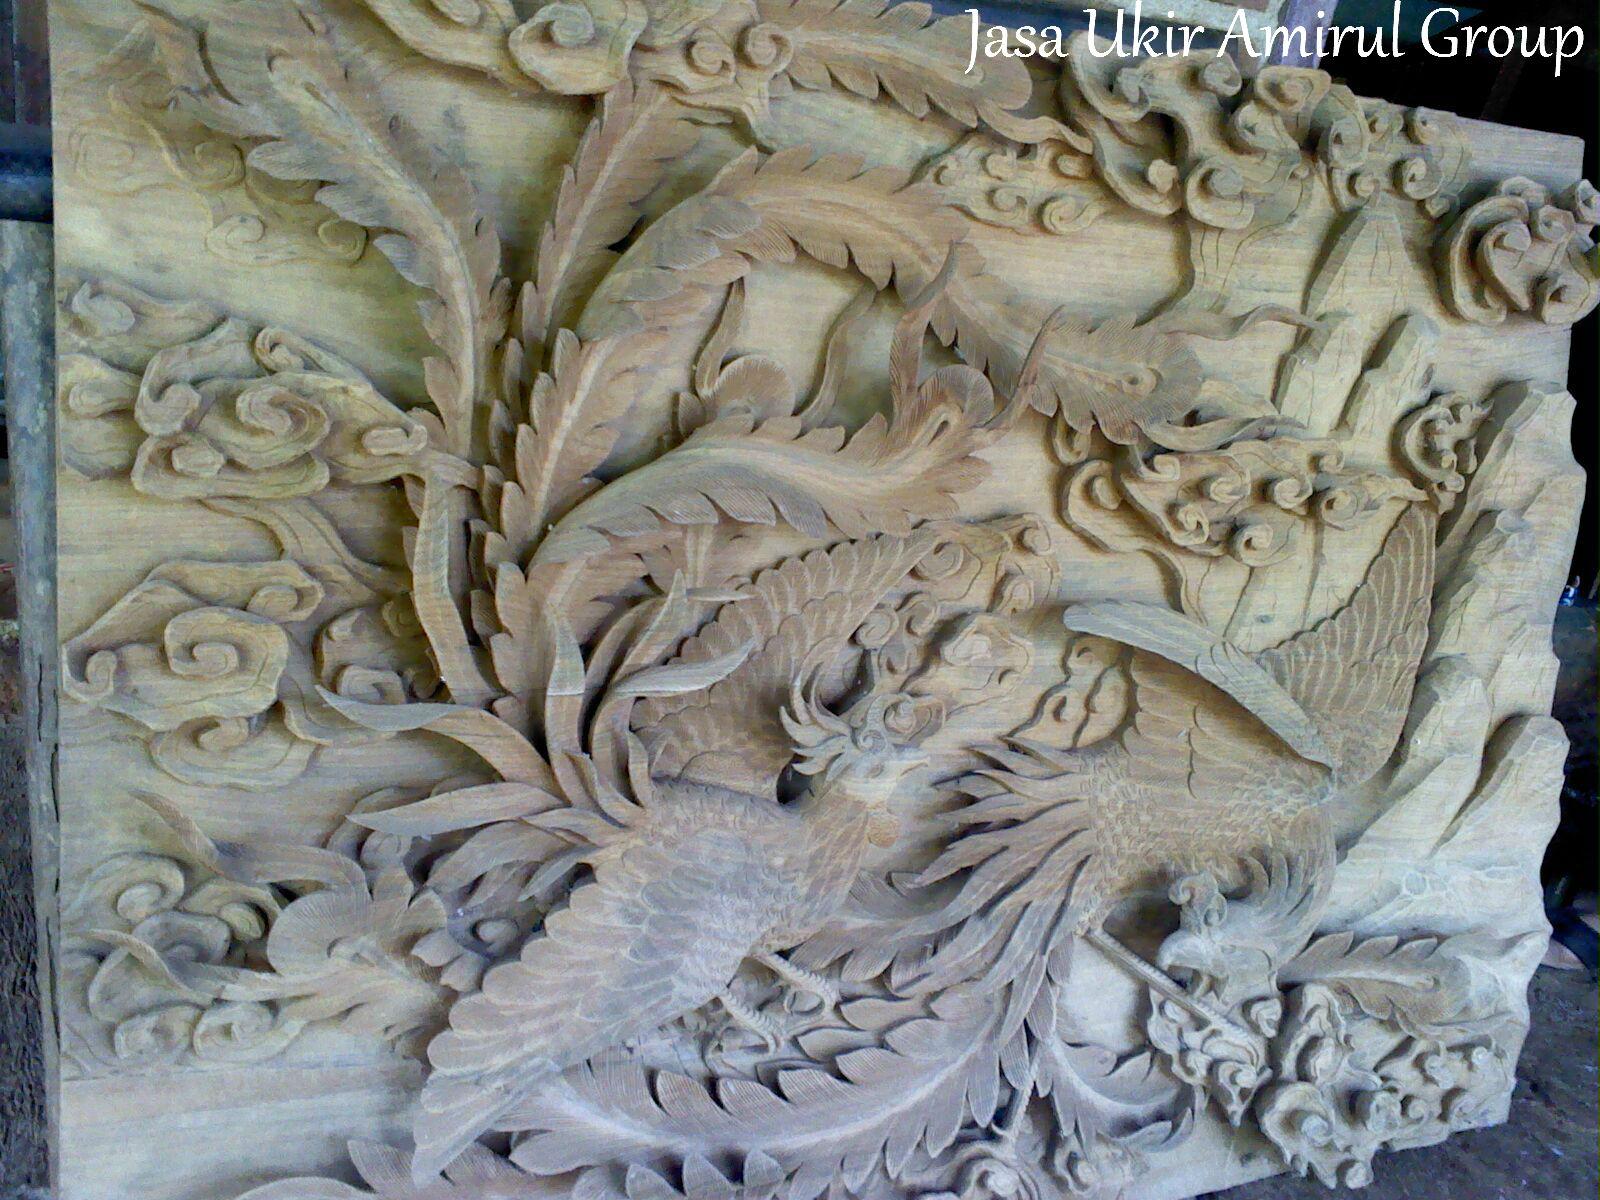 relief kayu jati glondong  Jasa Ukir Online  Jasa Ukiran